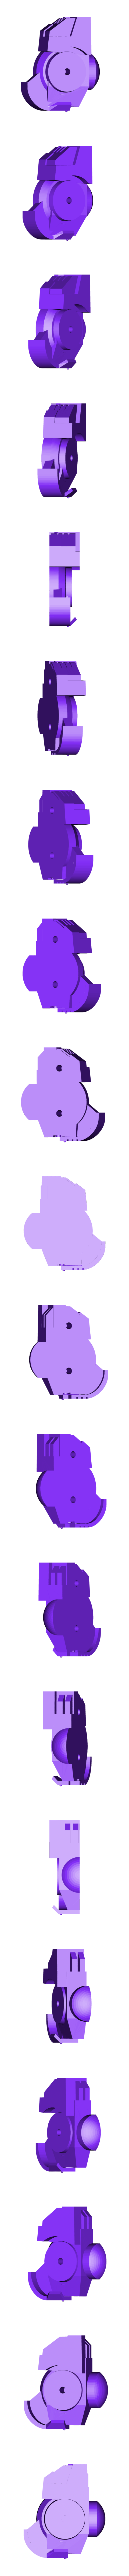 Print-PelvisR.stl Download free STL file Windup Automated Mausoleum for Nearly Dead Oversized Interstellar Jarheads • 3D printable template, FelixTheCrazy